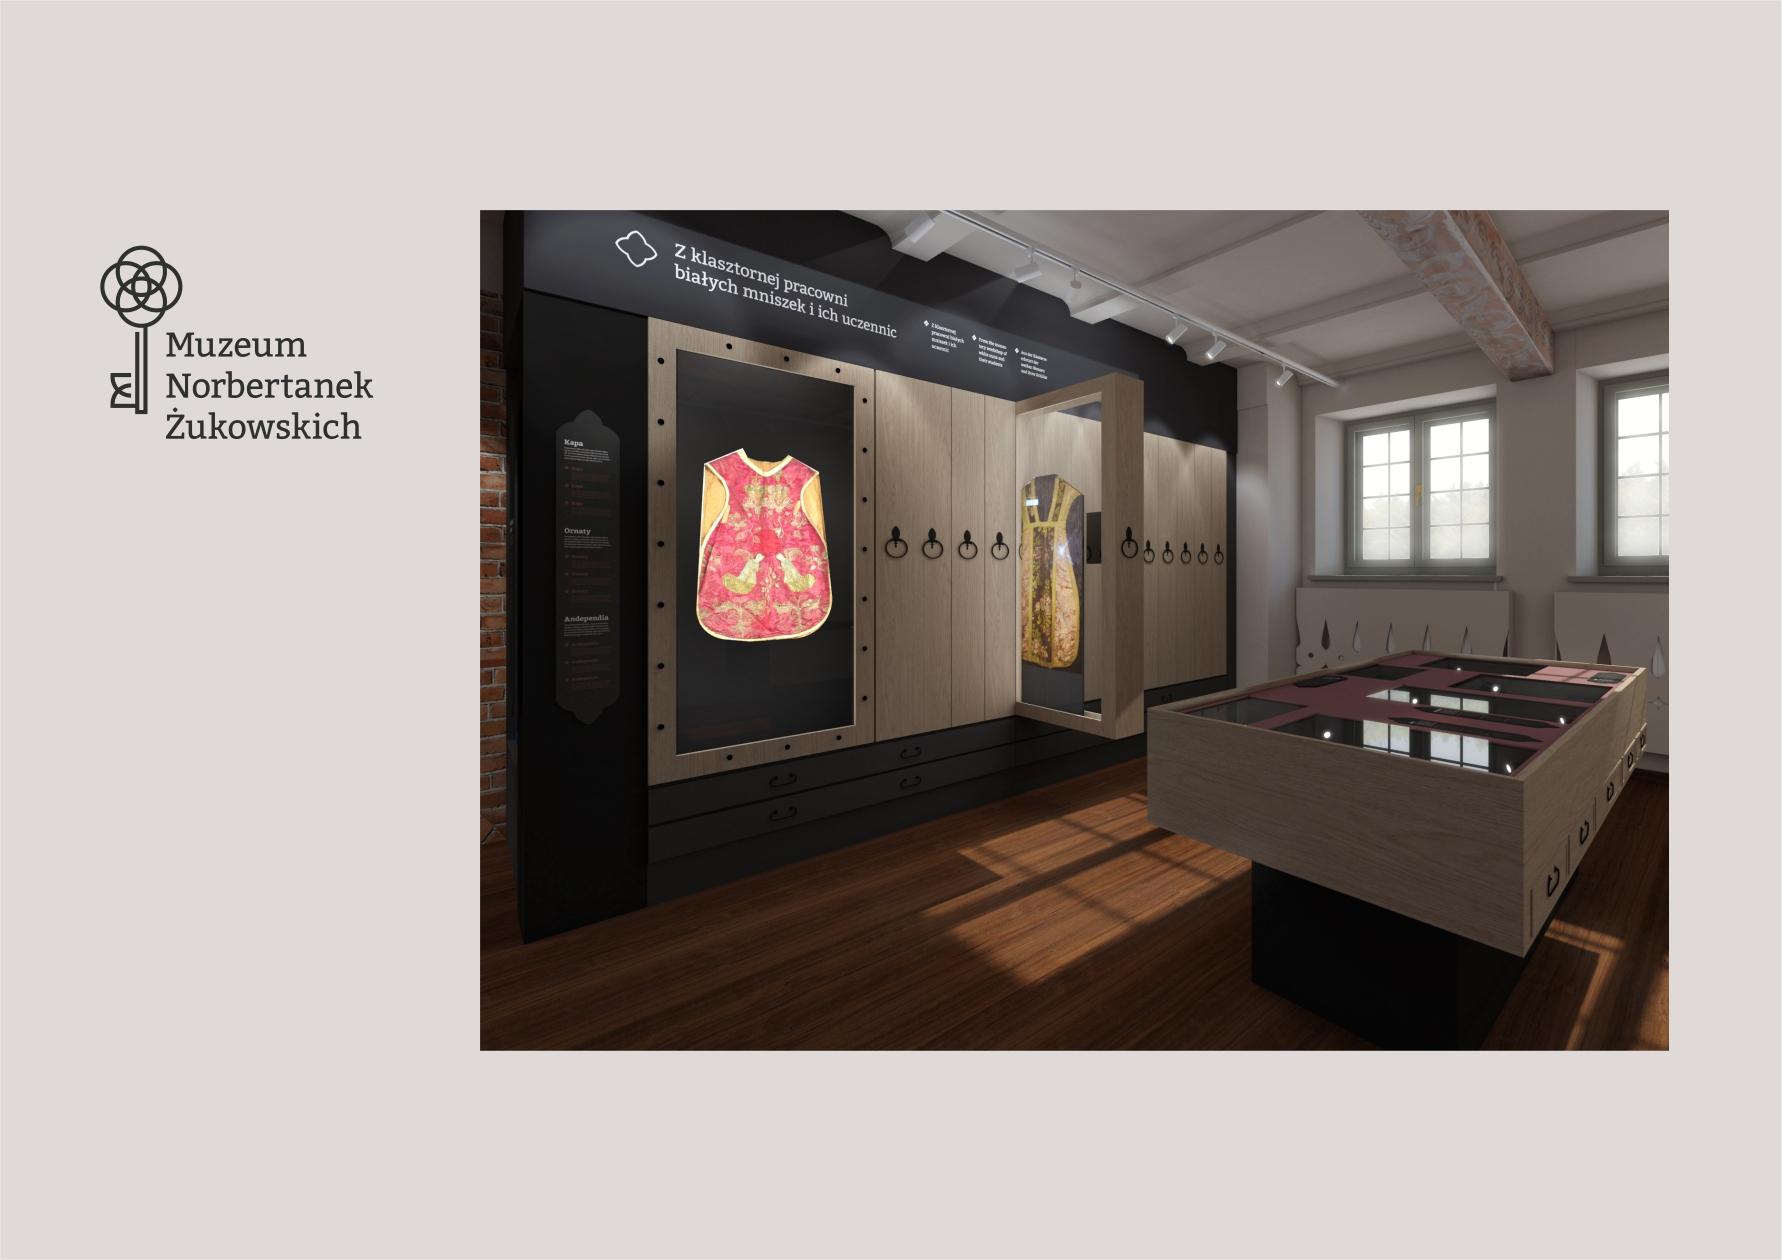 Muzeum Norbertanek Żukowskich